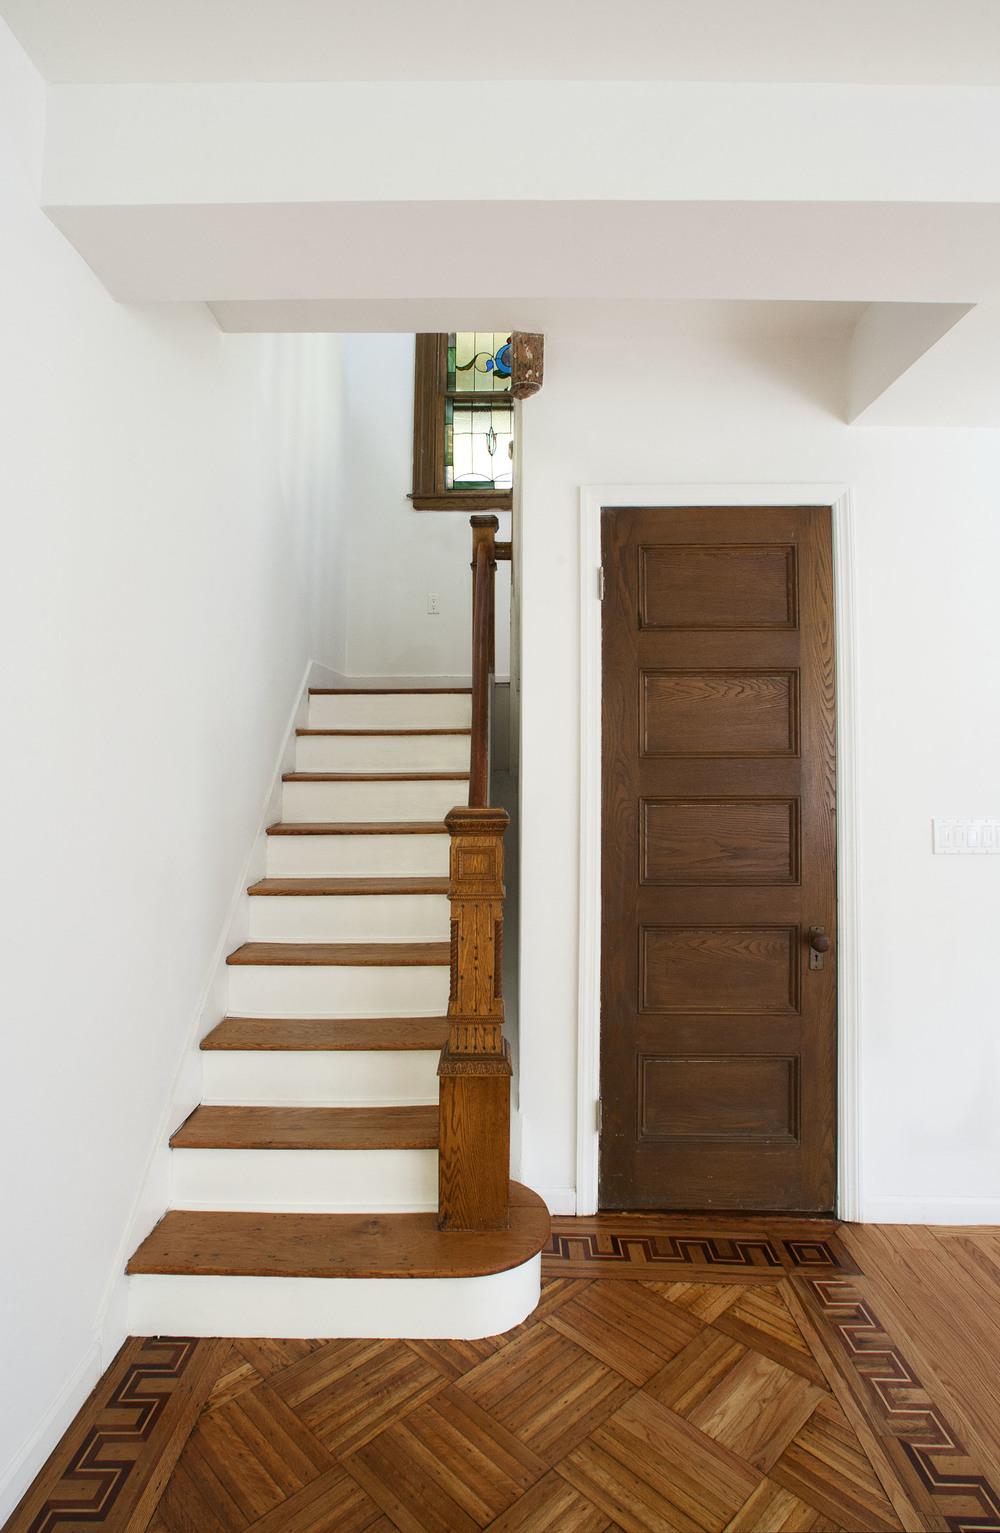 DitmasPark_Stairs.jpg